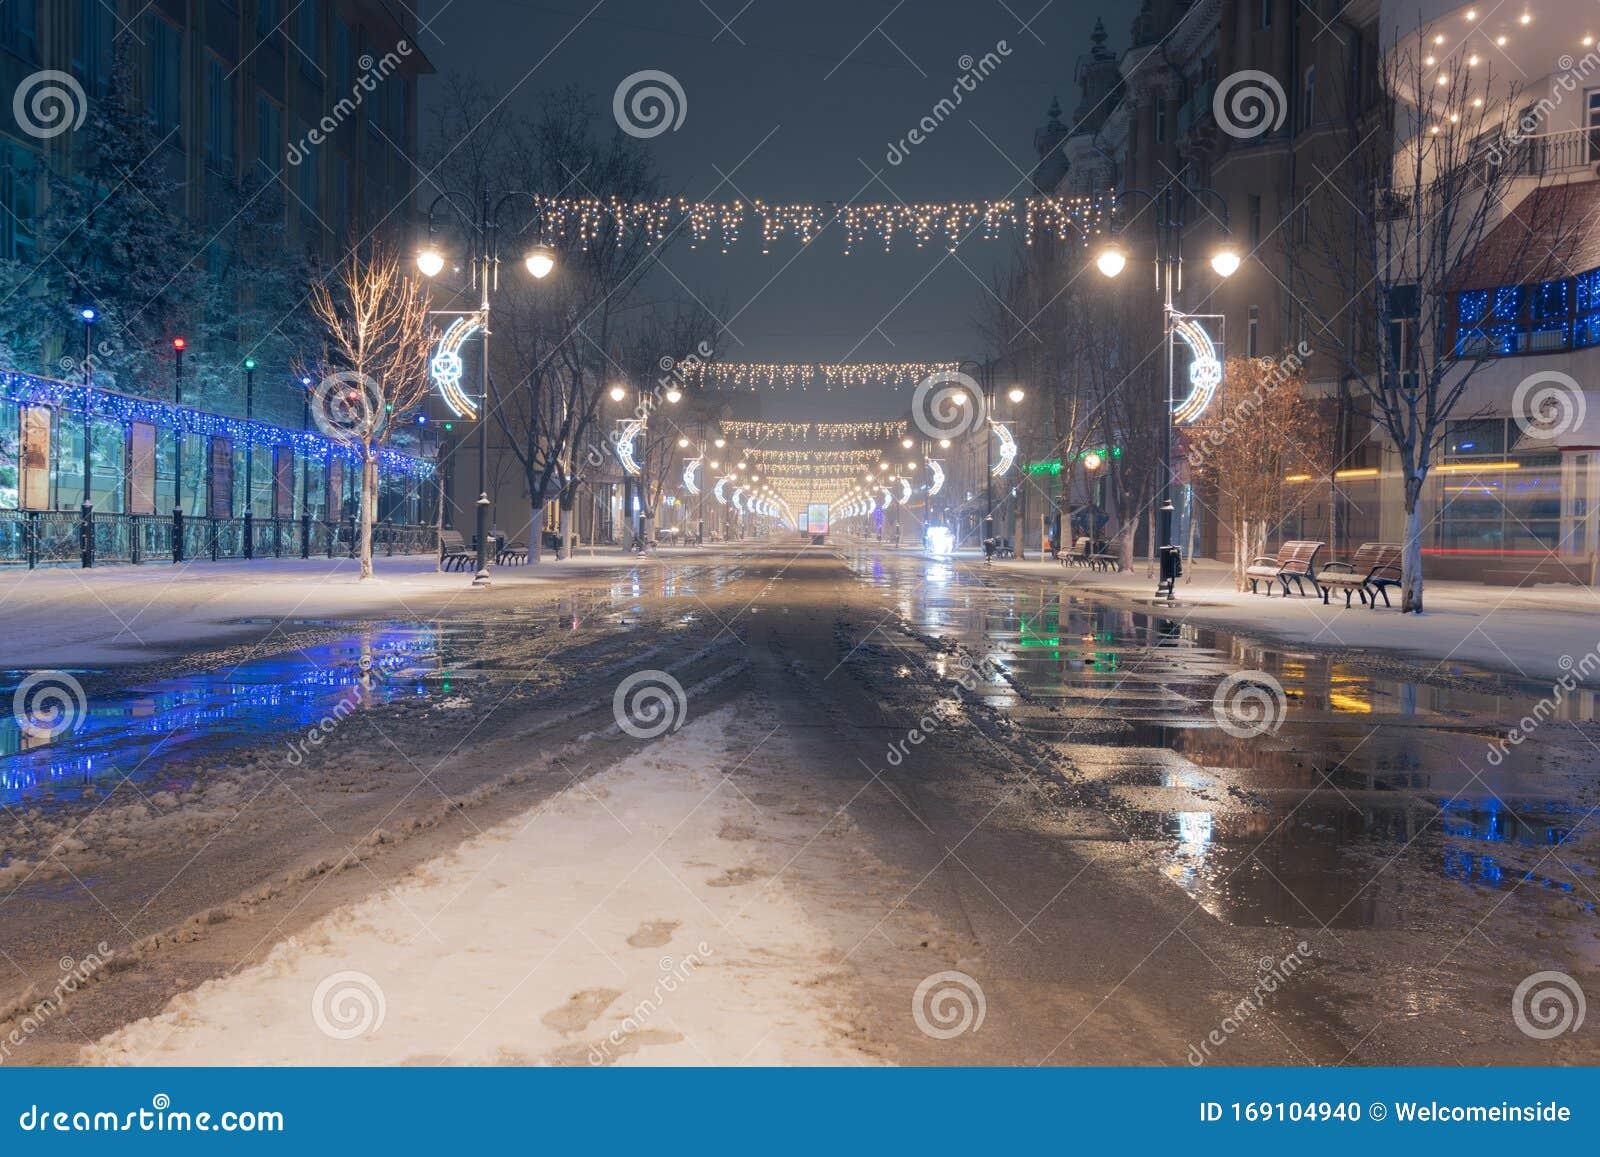 2020 Christmas Lights Pedestrian Central Pedestrian Street Saratov City   Kirova Avenue In